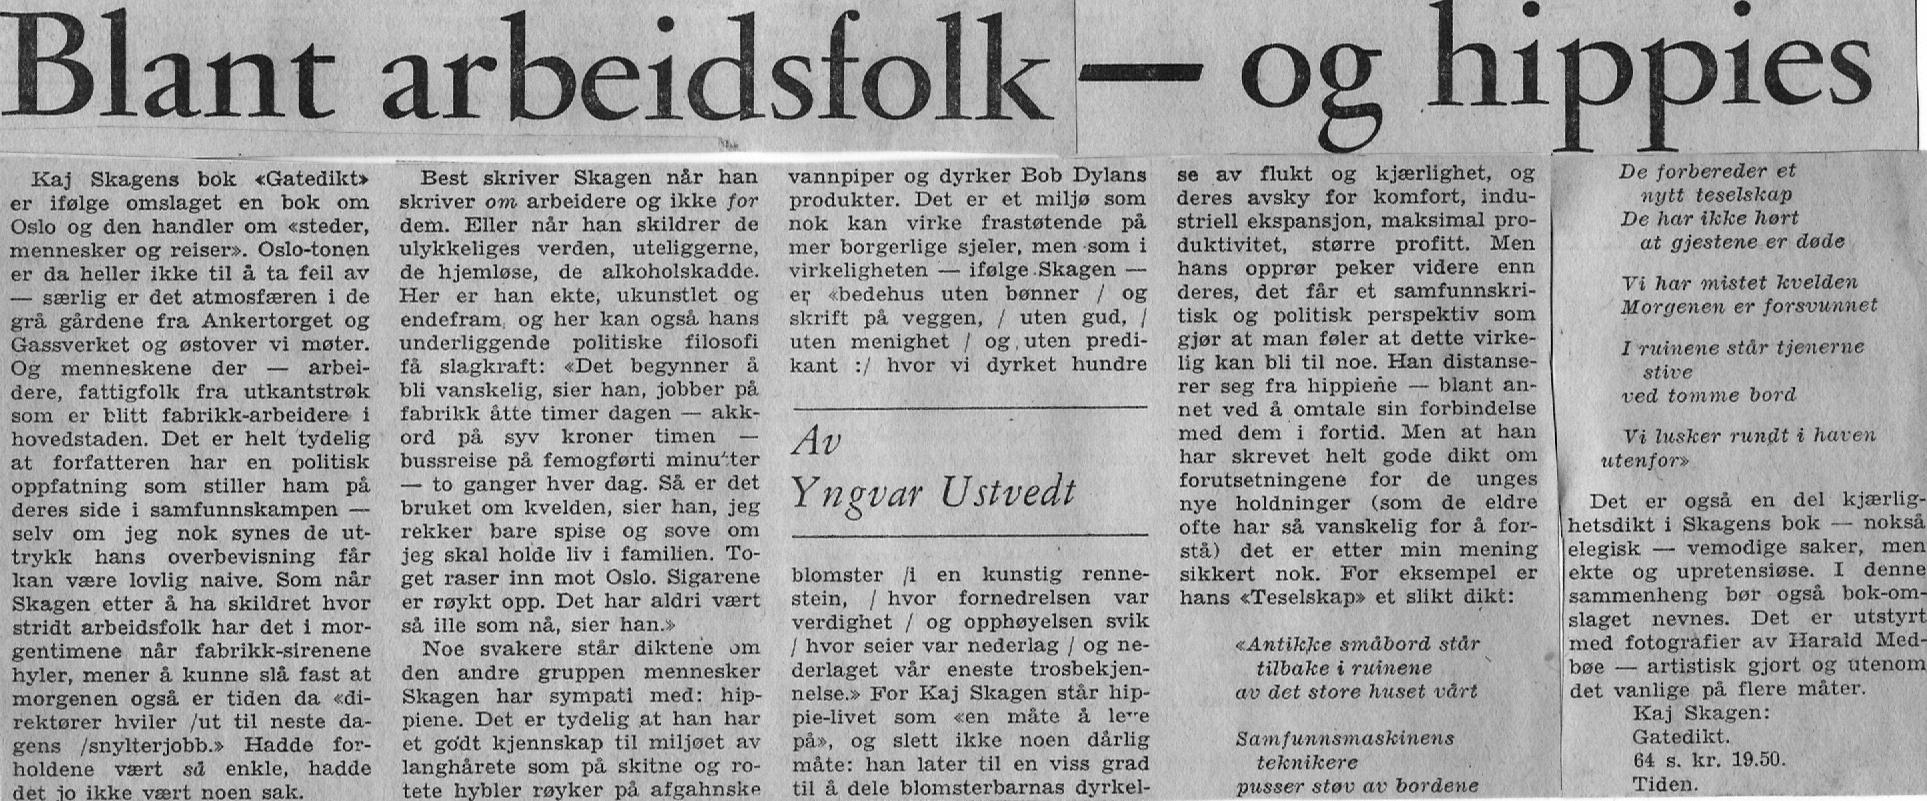 Utklipp fra Dagbladet 1971